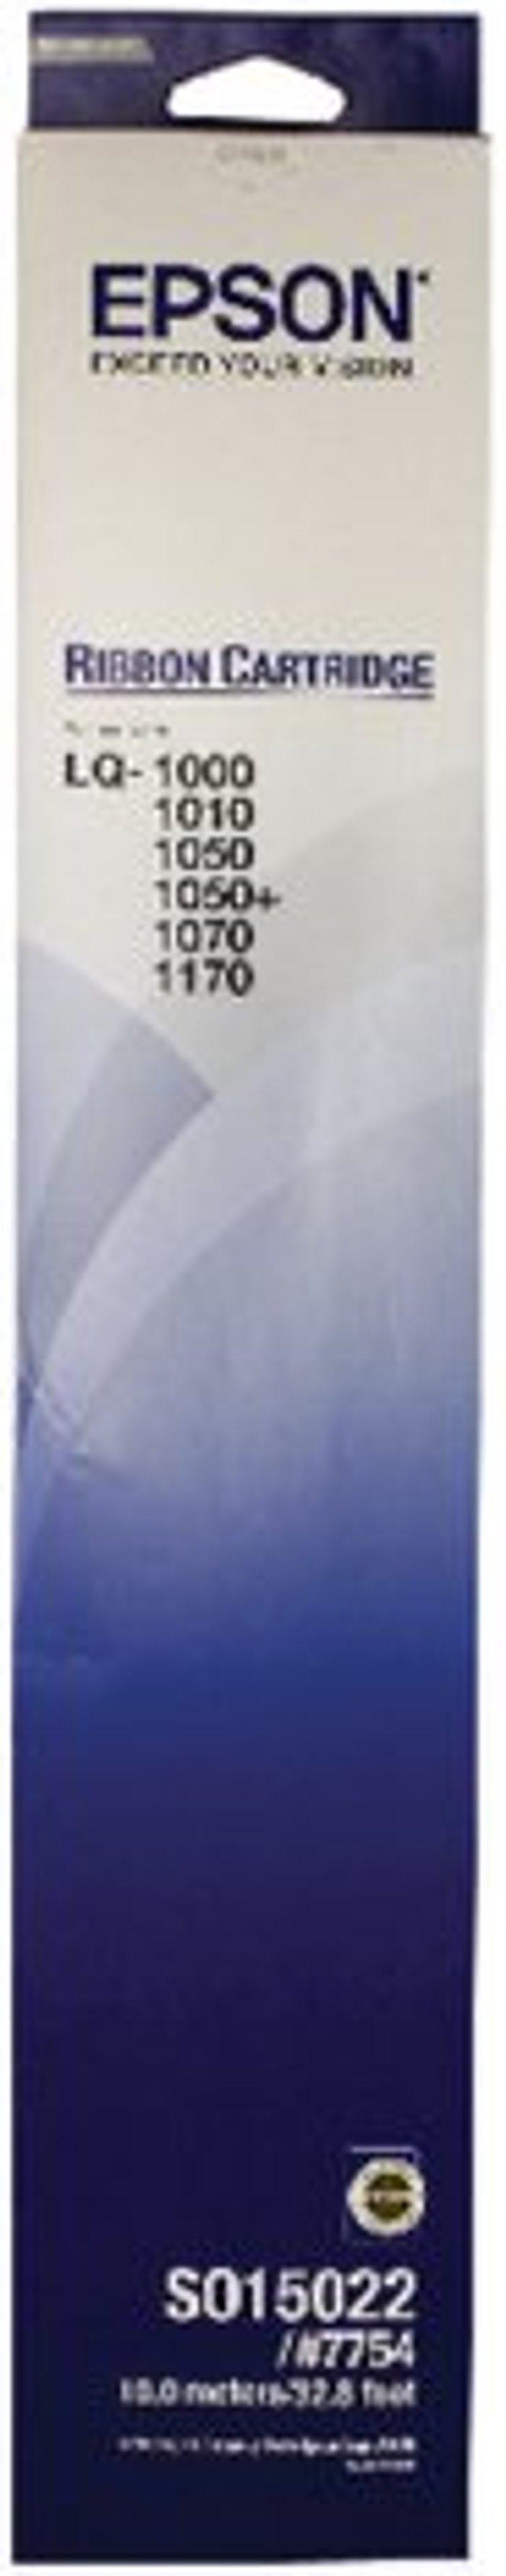 Epson Epson Fabric Ribbon Cassette Black RC100010 7754 C13S015022